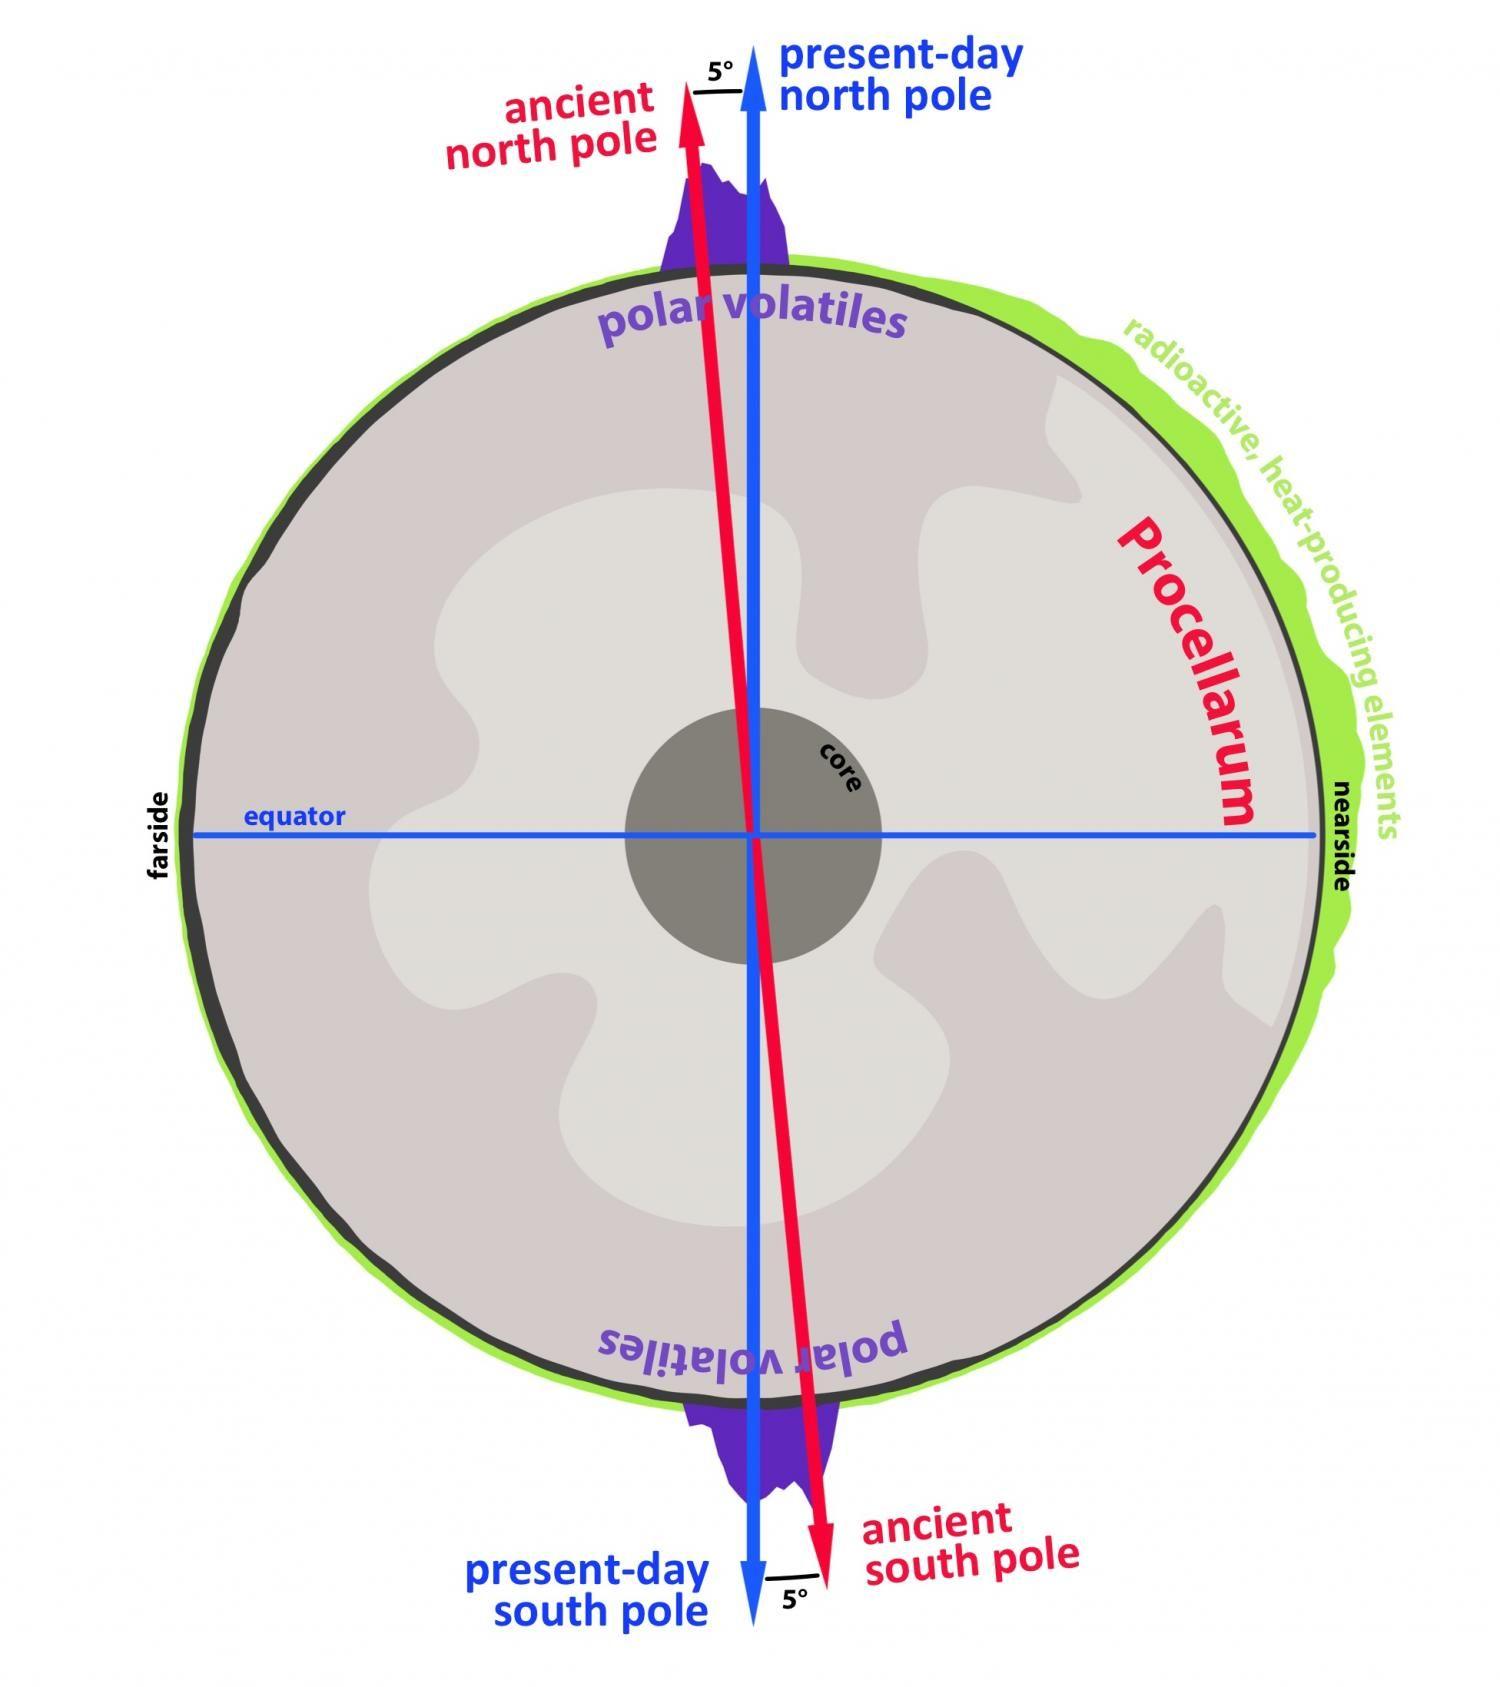 Earth S Moon Wandered Off Axis Billions Of Years Ago